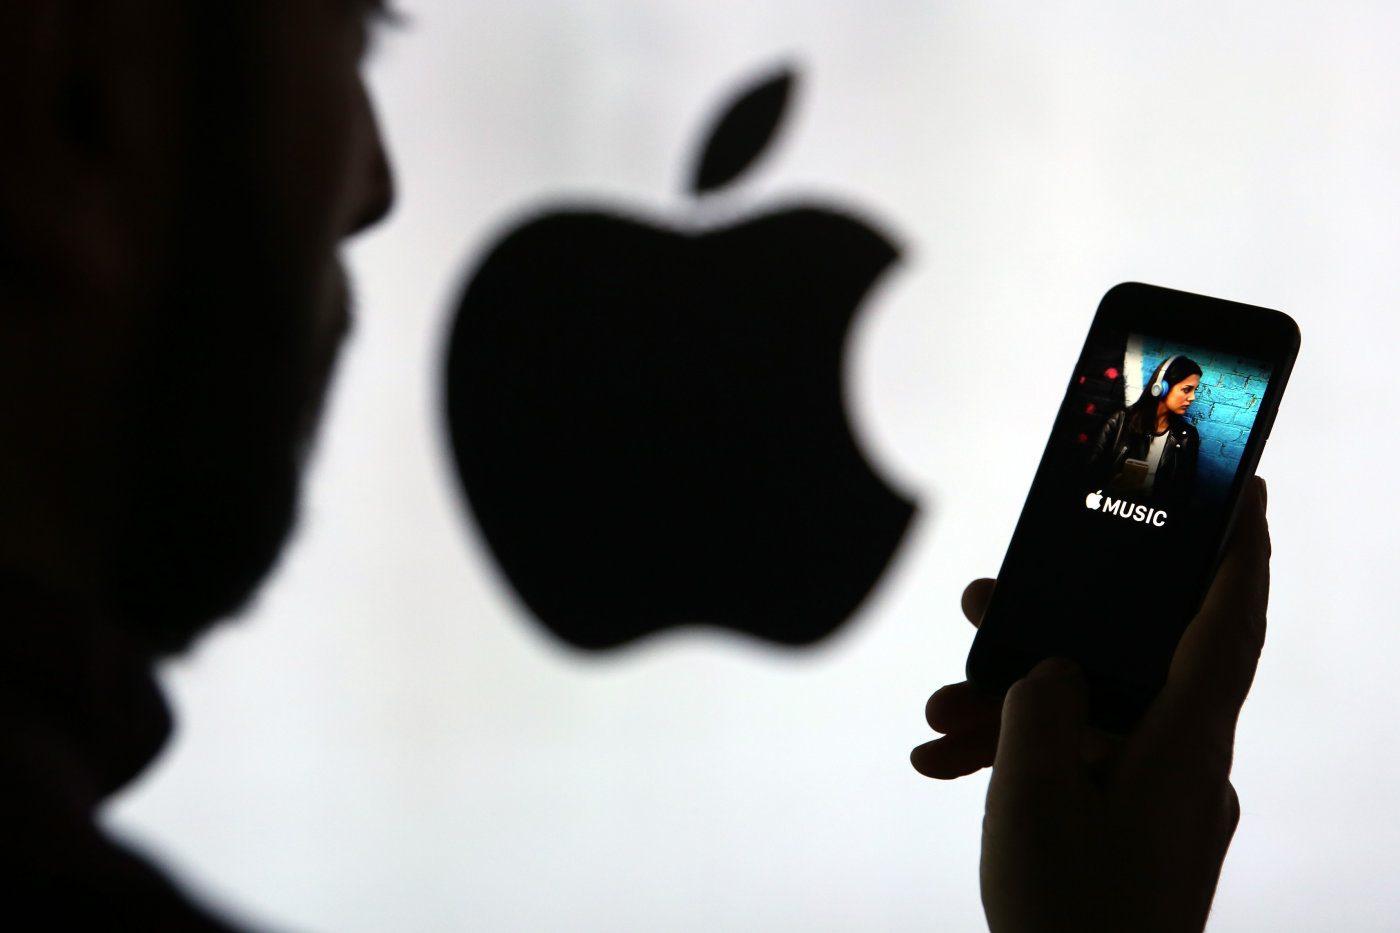 Apple Music consiguió 10 millones de suscriptores